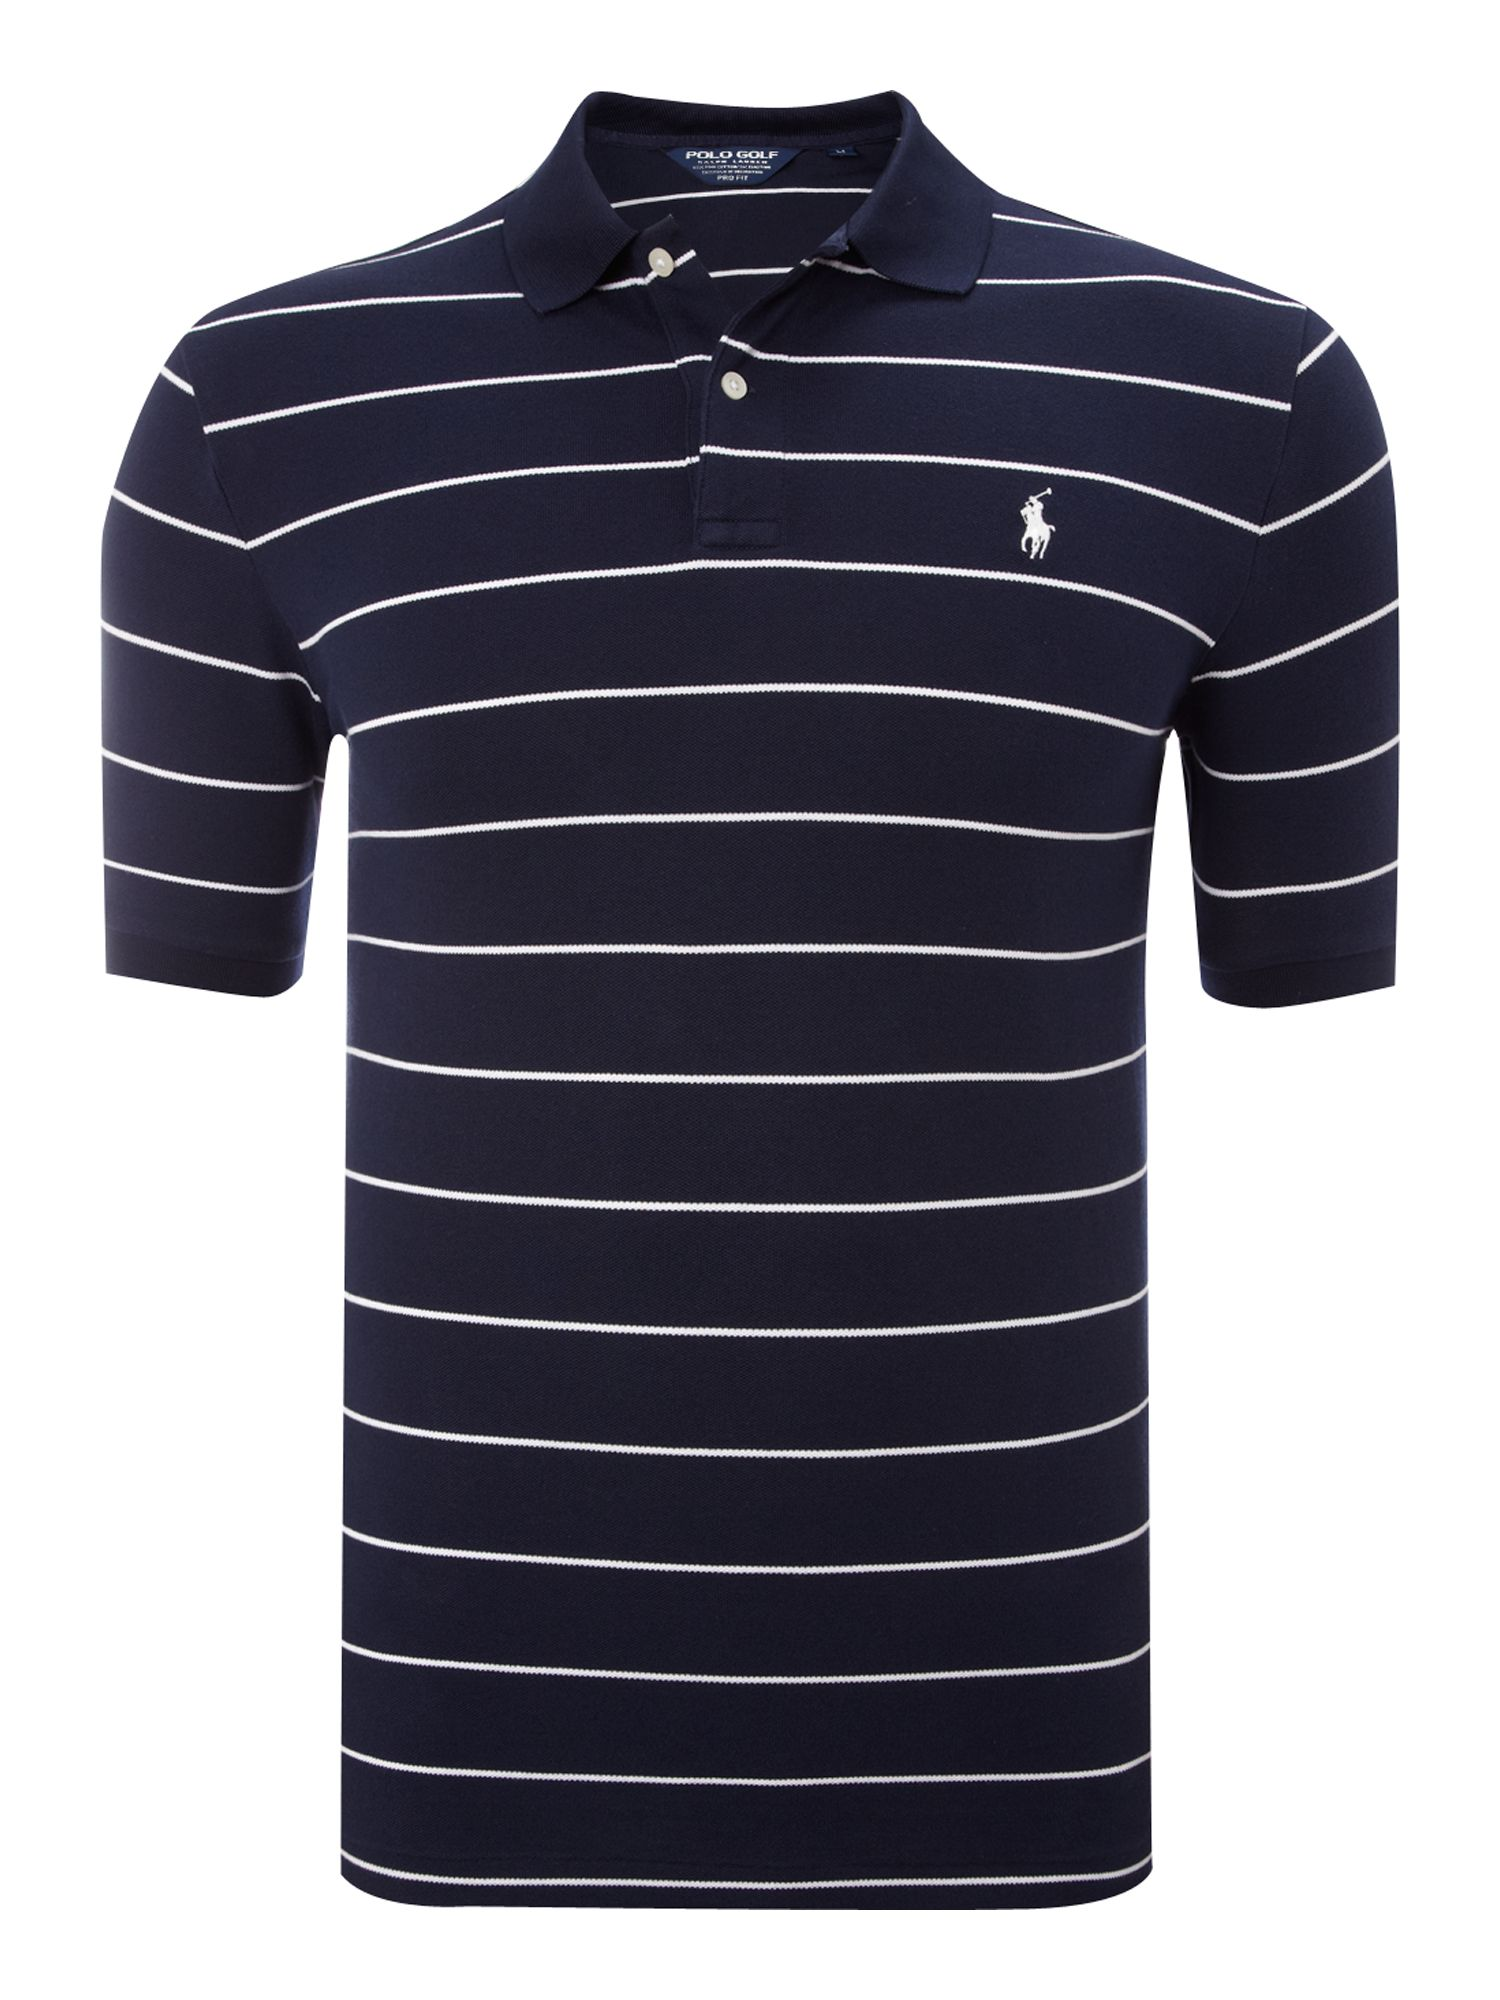 Ralph Lauren Golf Pencil Stripe Short Sleeve Polo Shirt In